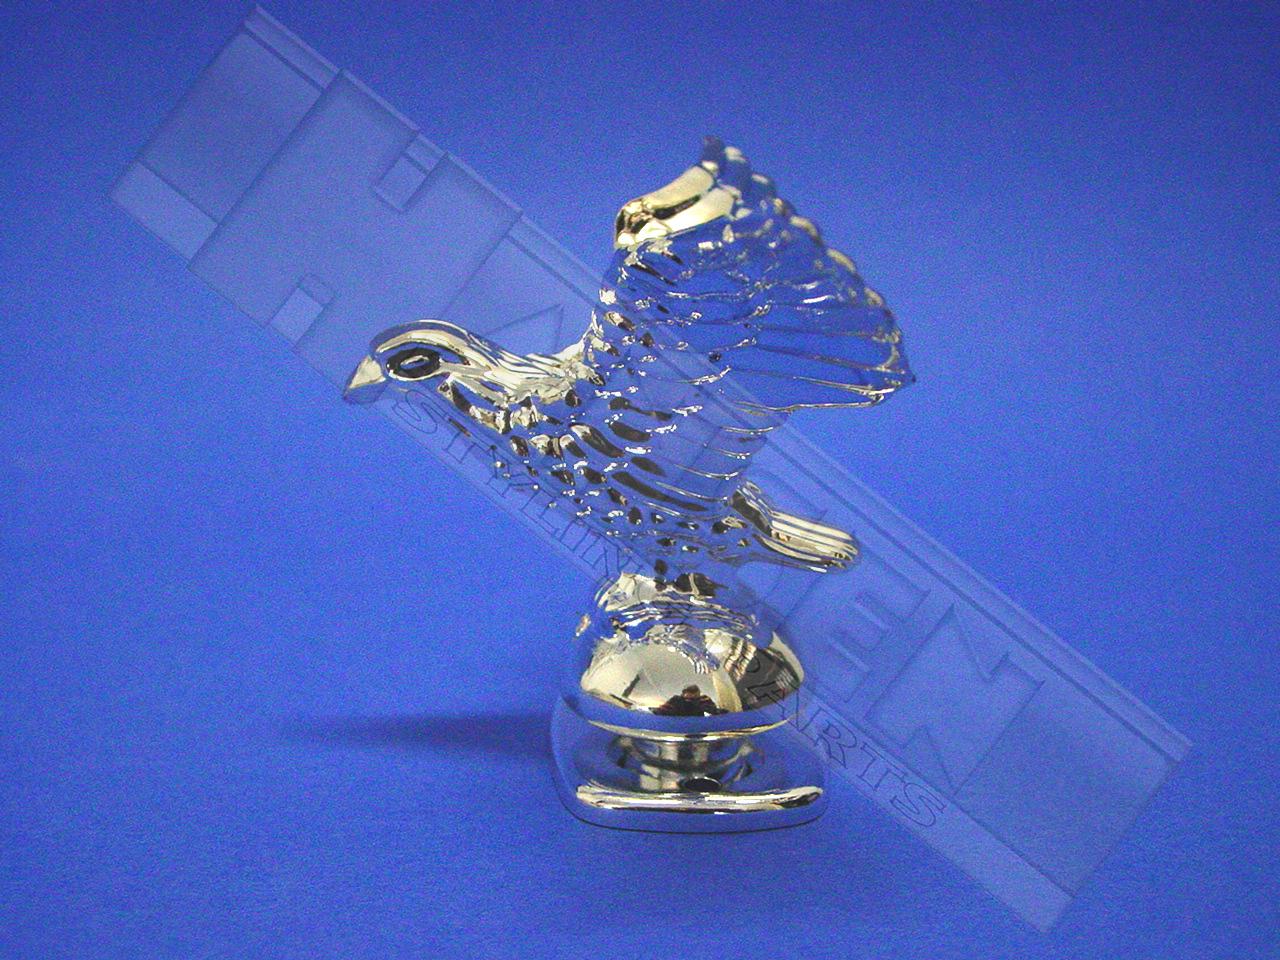 zierfigur fliegender adler emblem ornament fenderemblem